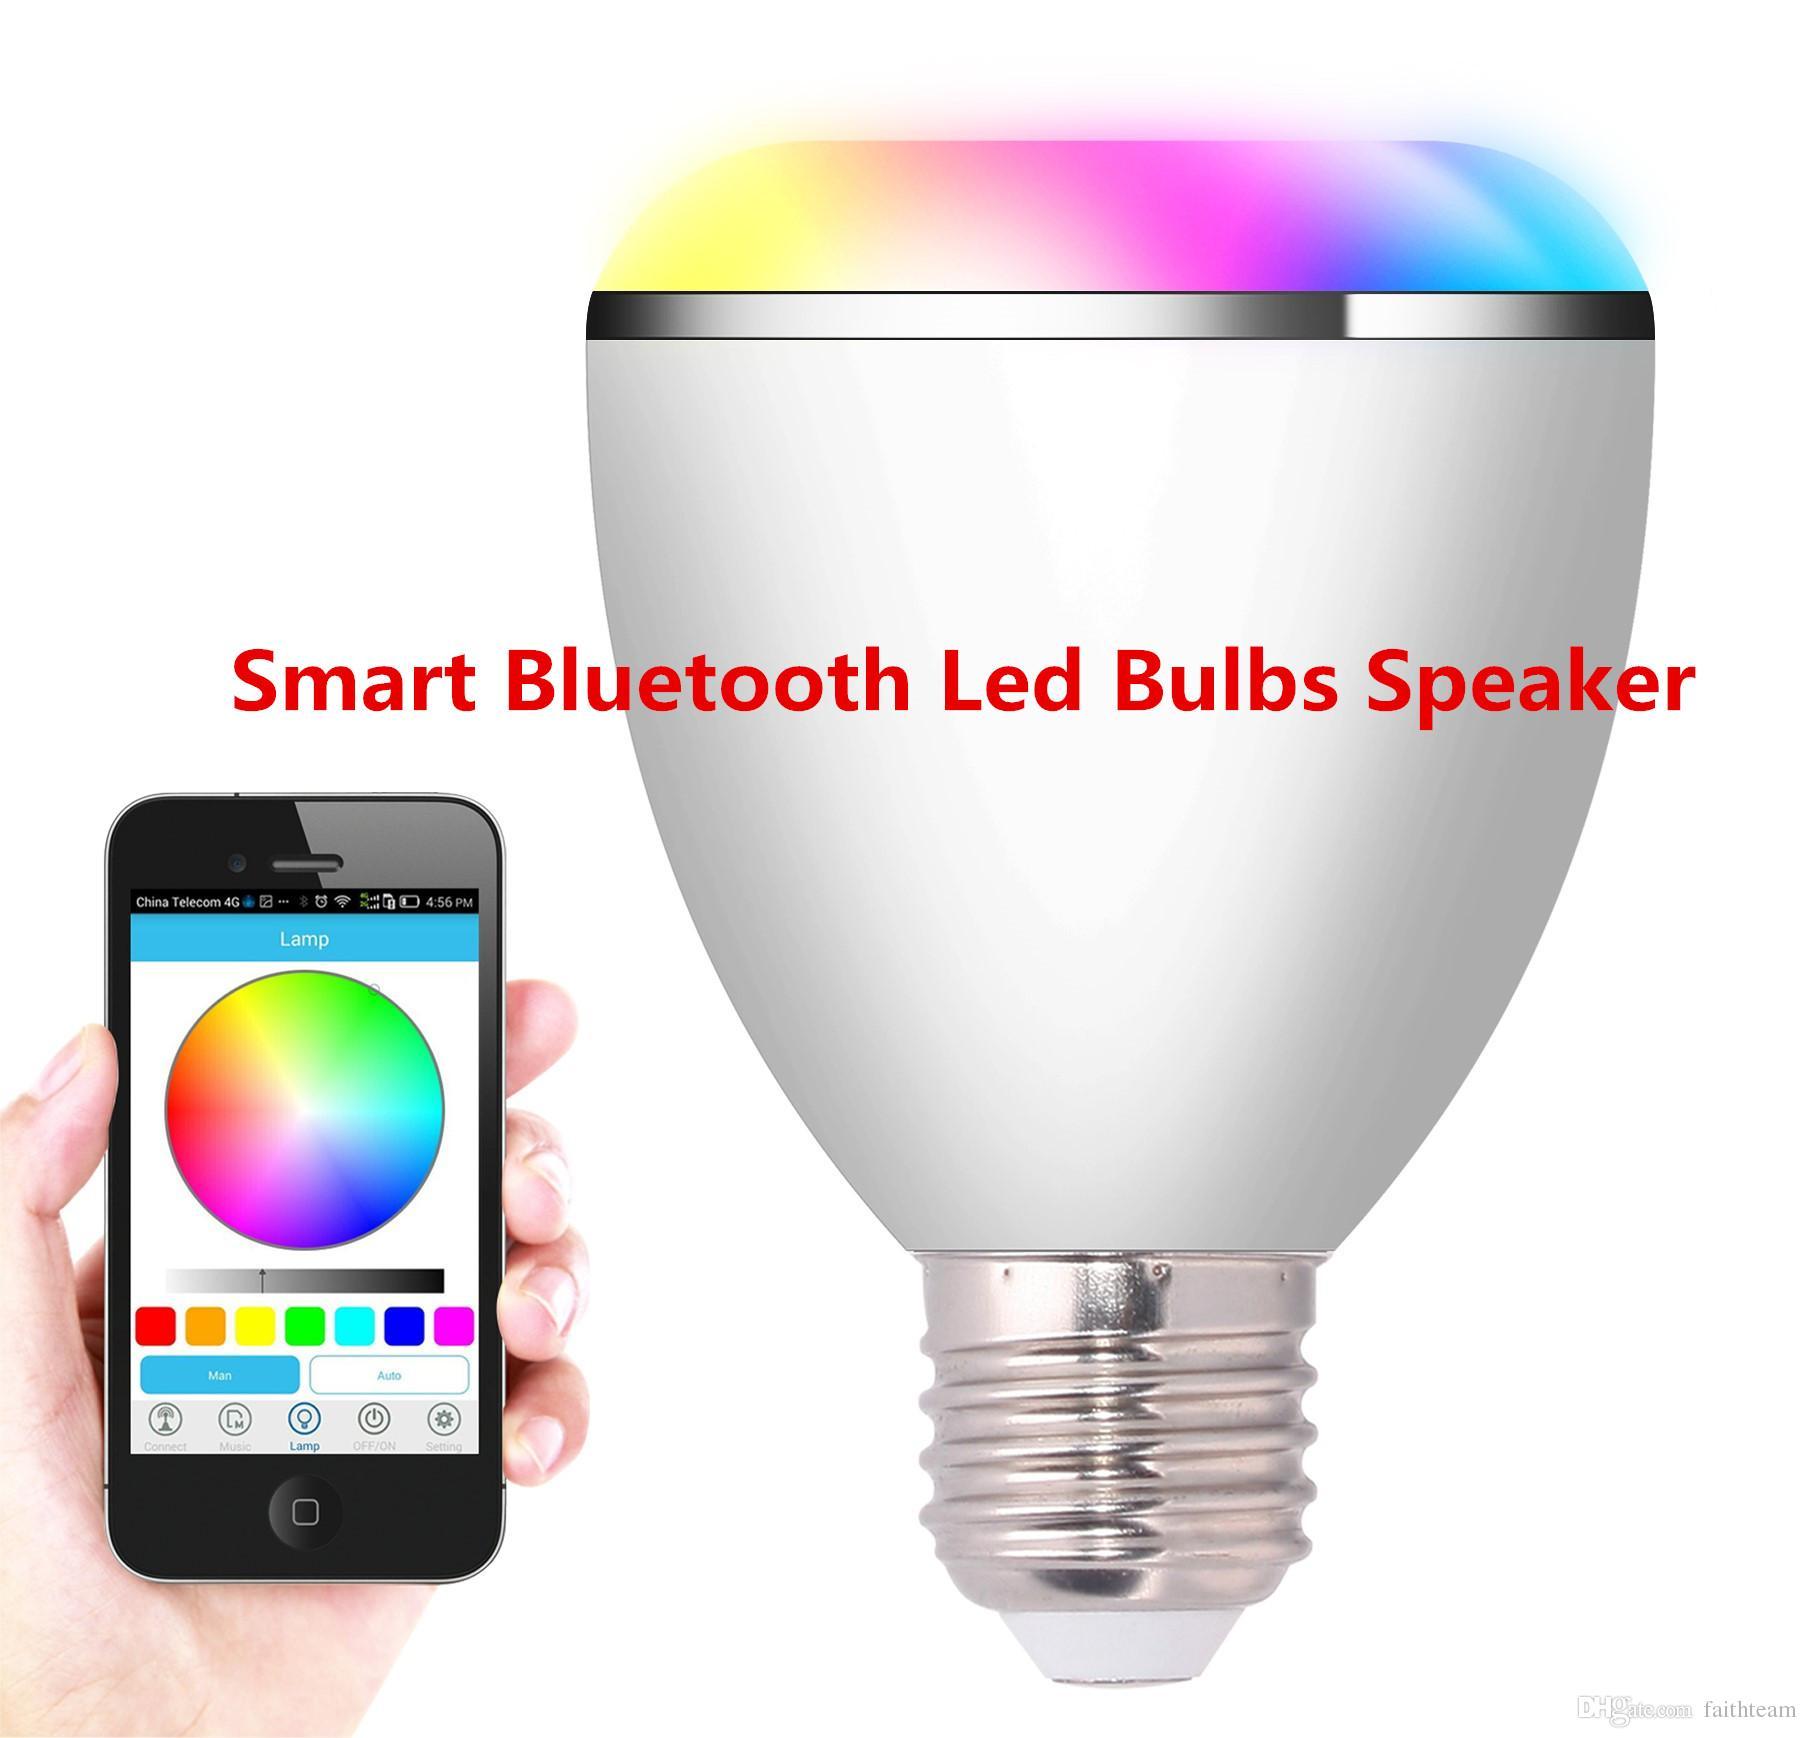 Smart bluetooth led bulbs speaker 6w blubs and 3w speaker for Bluetooth bulb